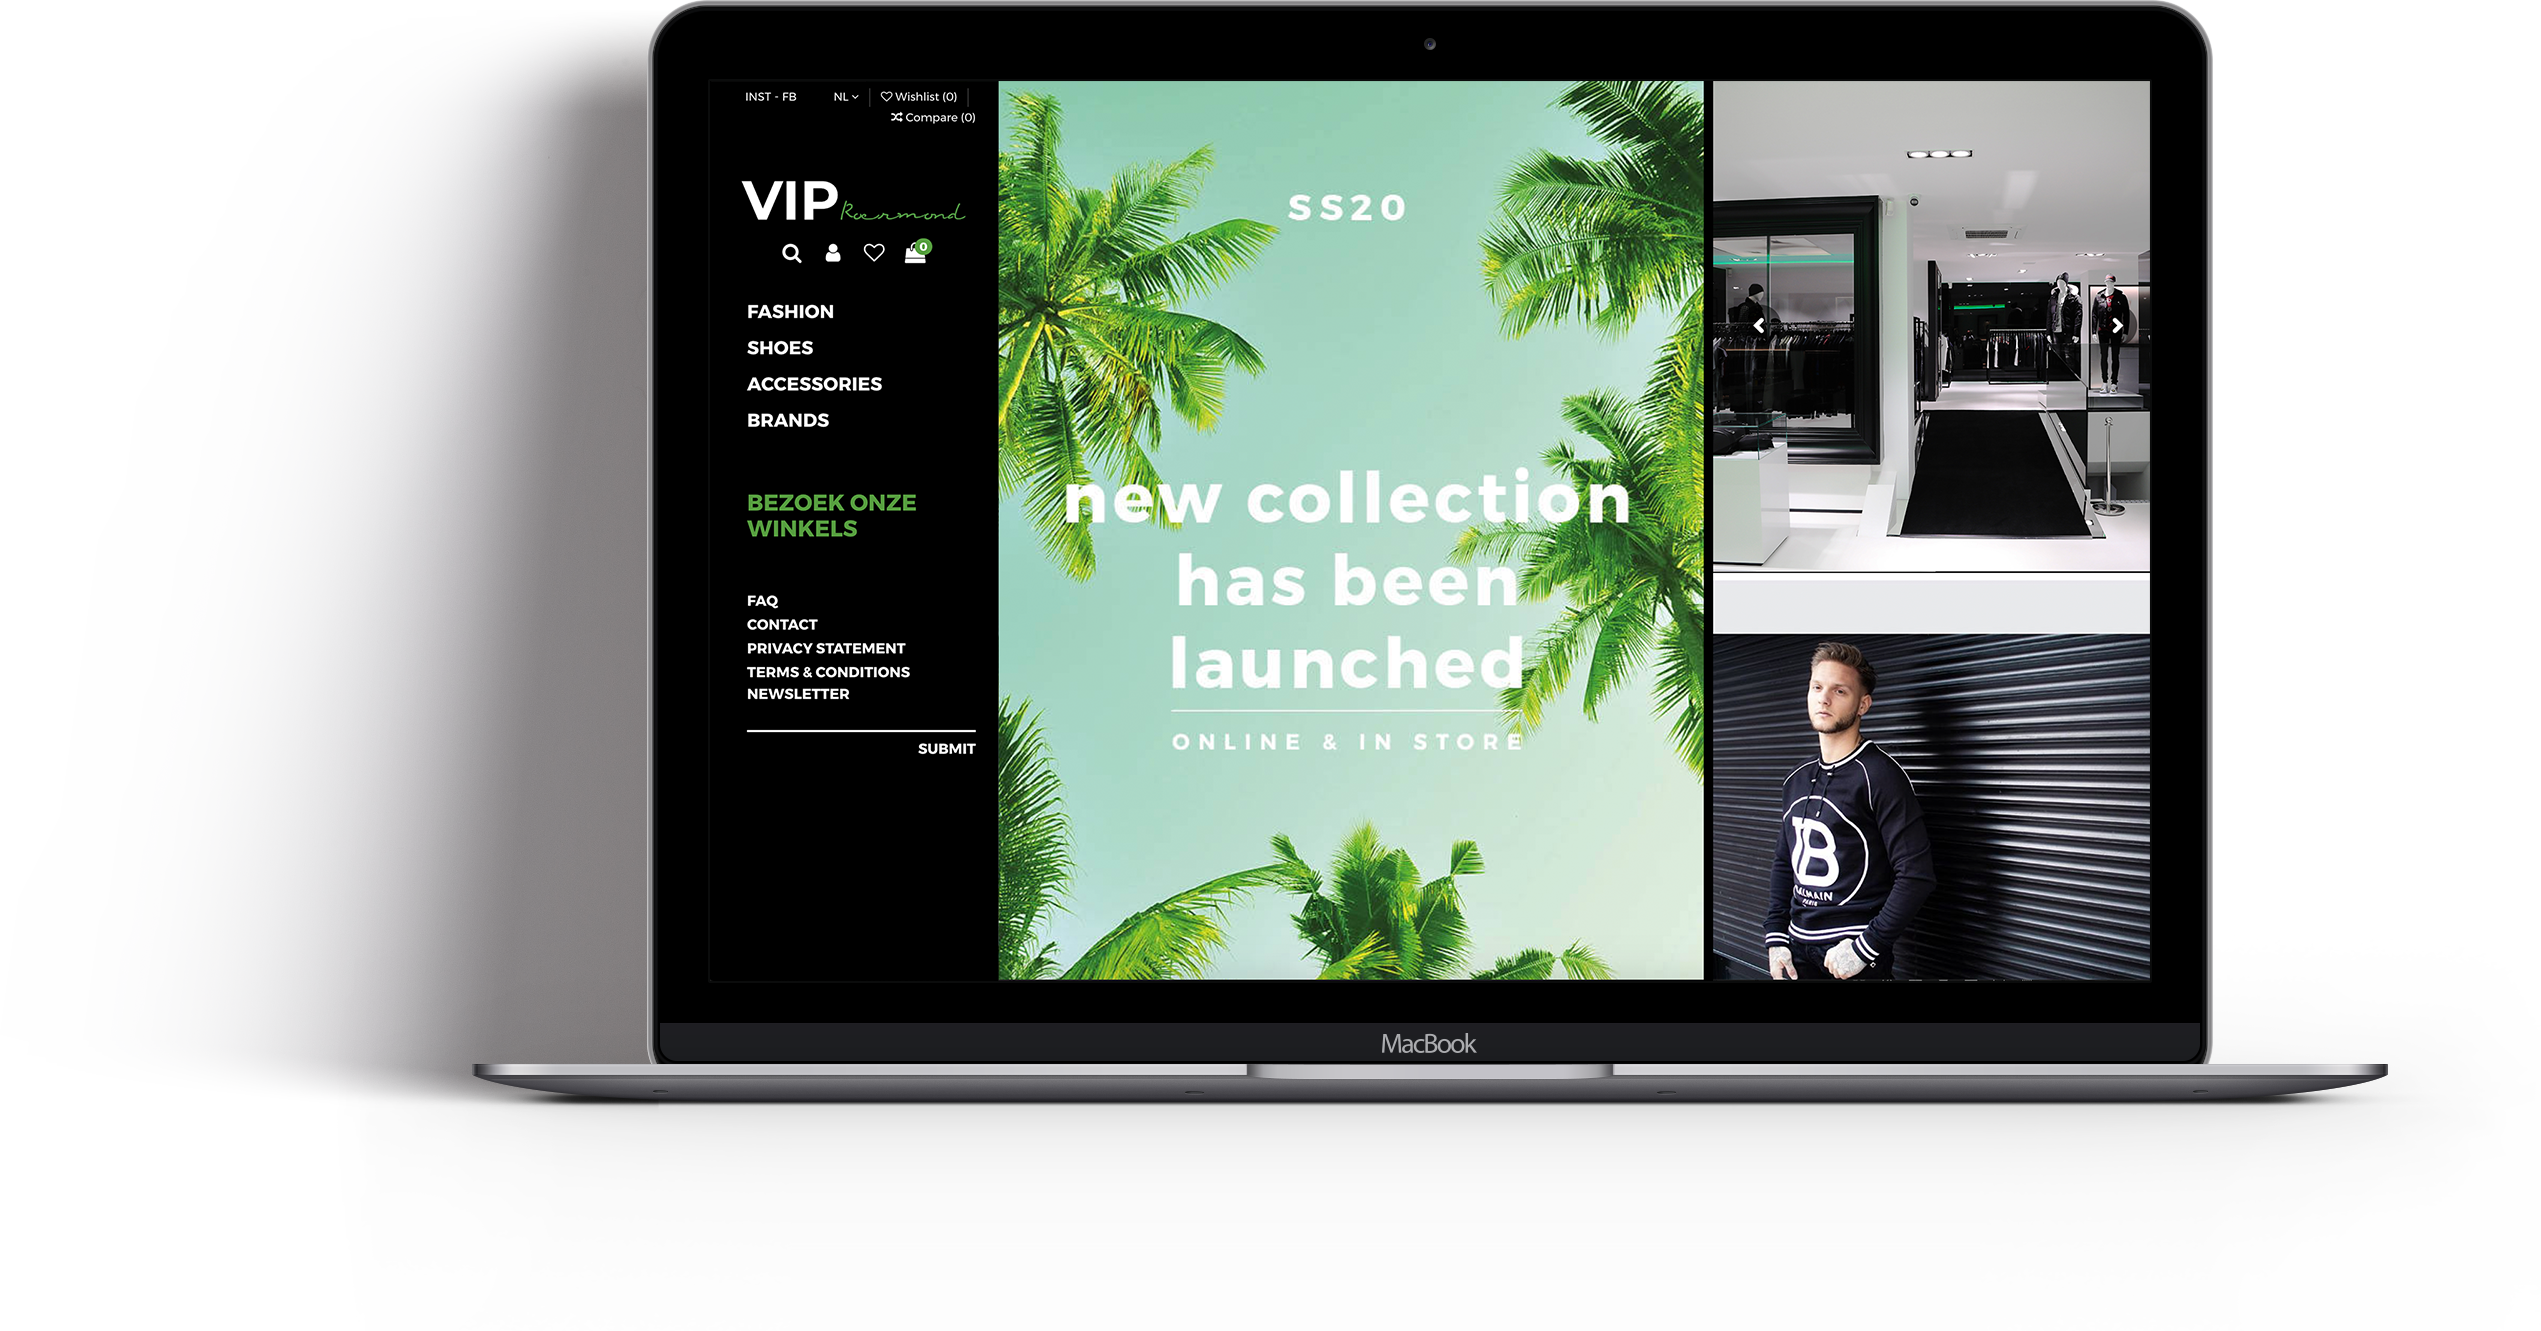 Webshop VIP Roermond